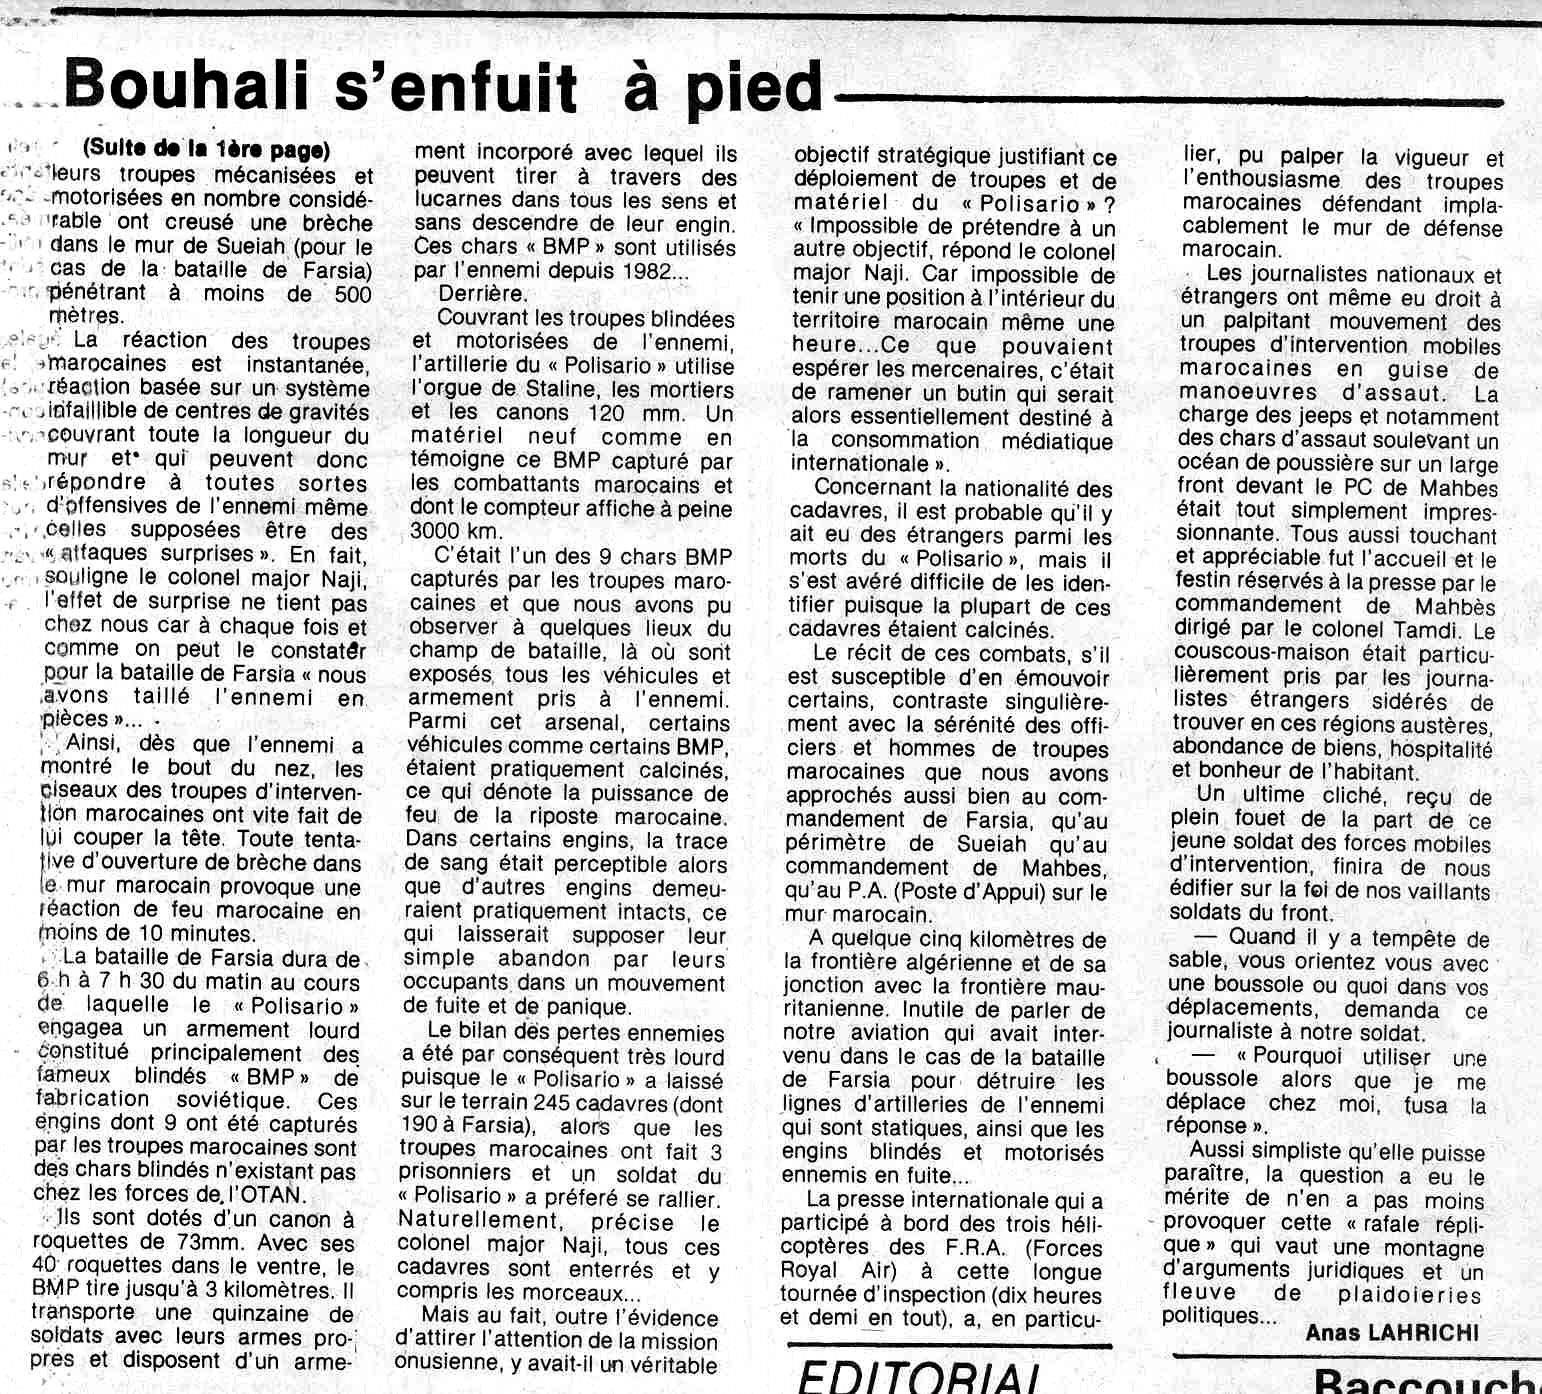 La Bataille de Farsia - 18 novembre 1987 - Page 2 50614975713_d099ab6c32_o_d